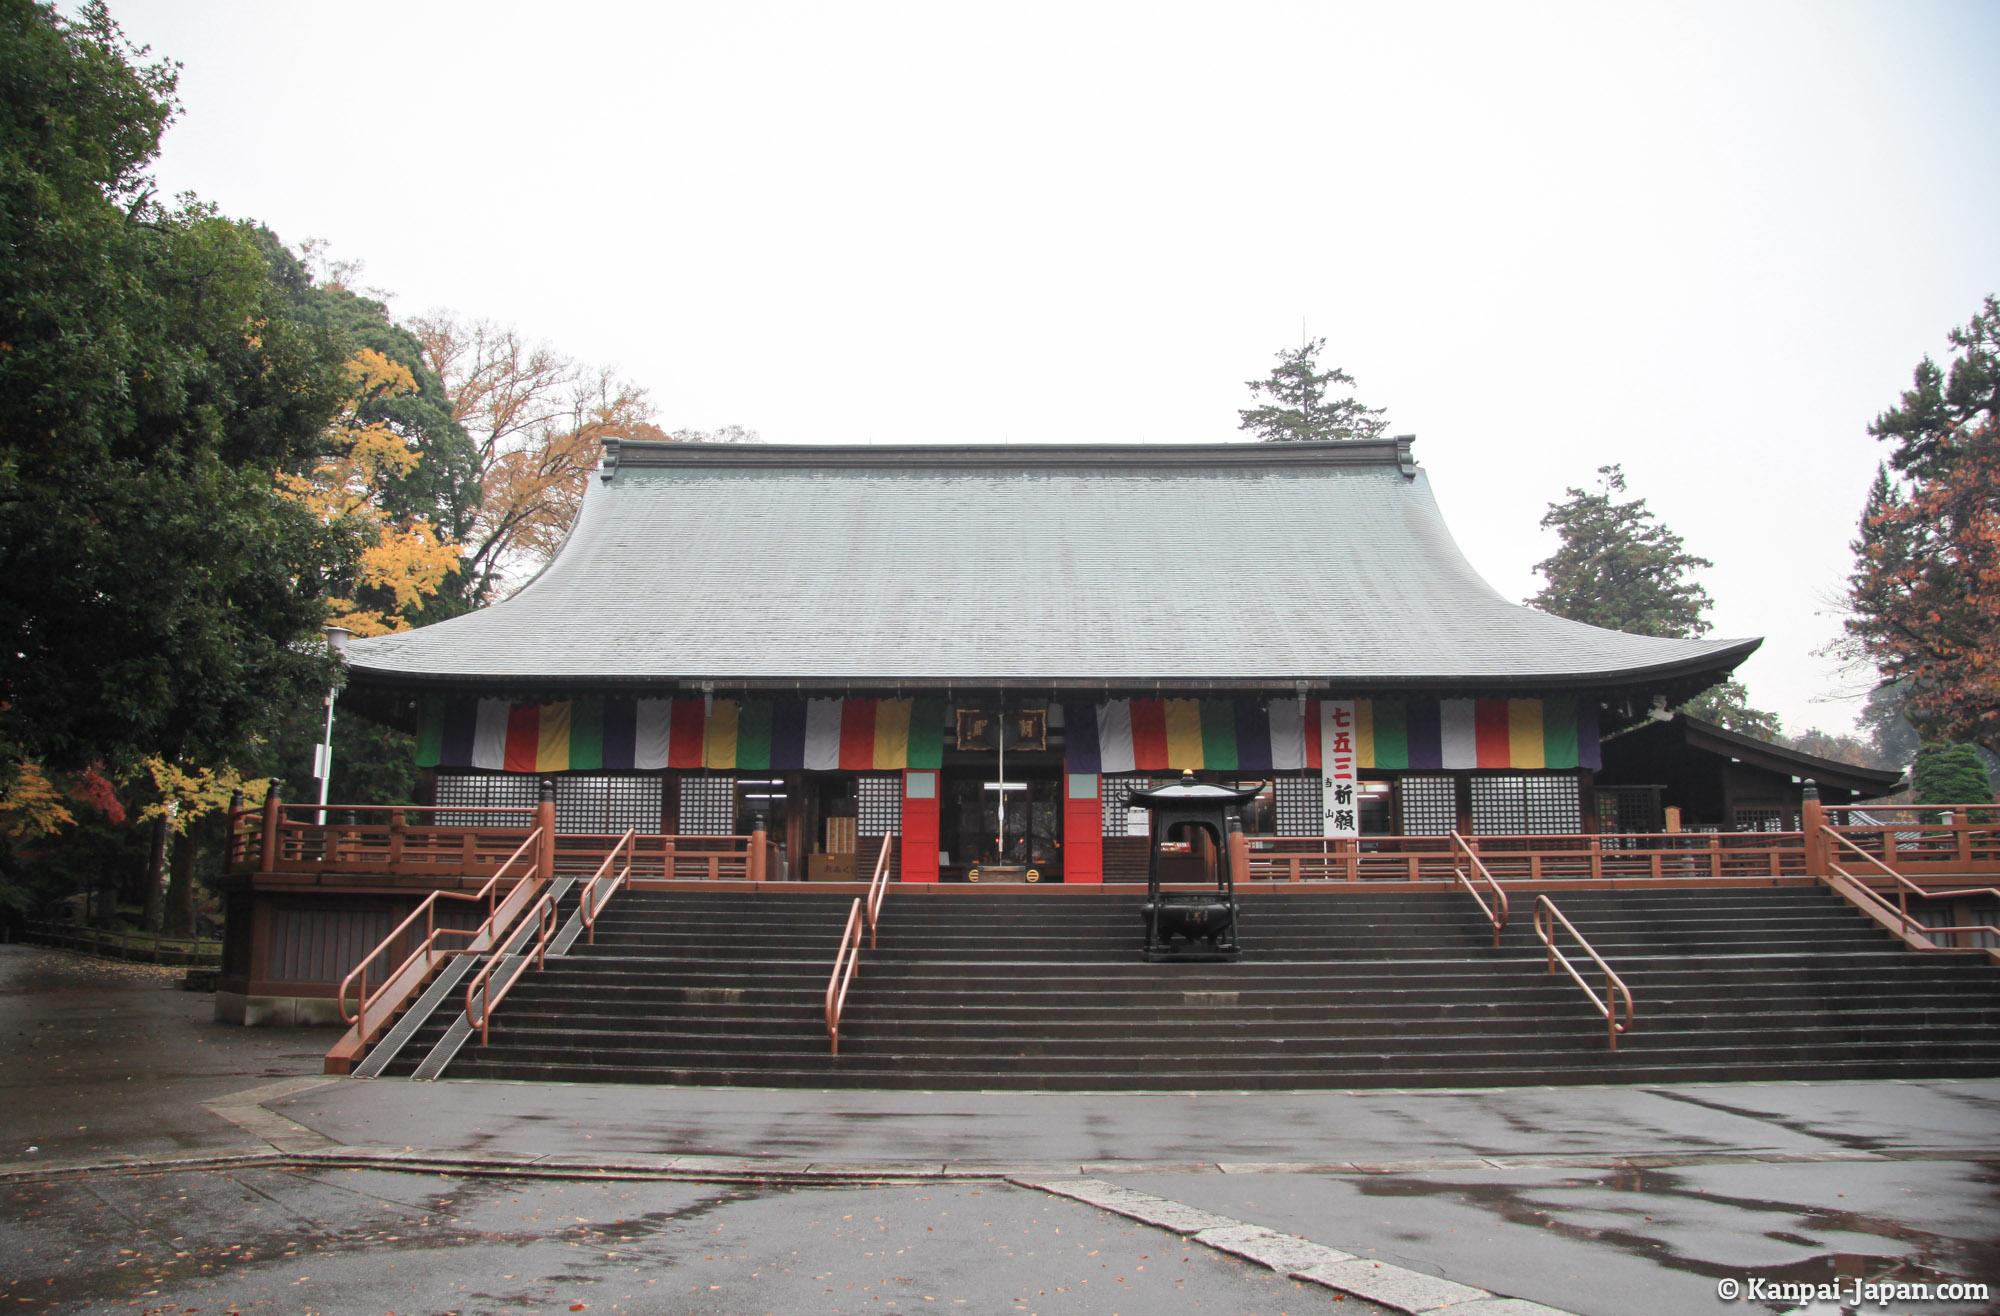 Kawagoe The Disappointing Little Edo